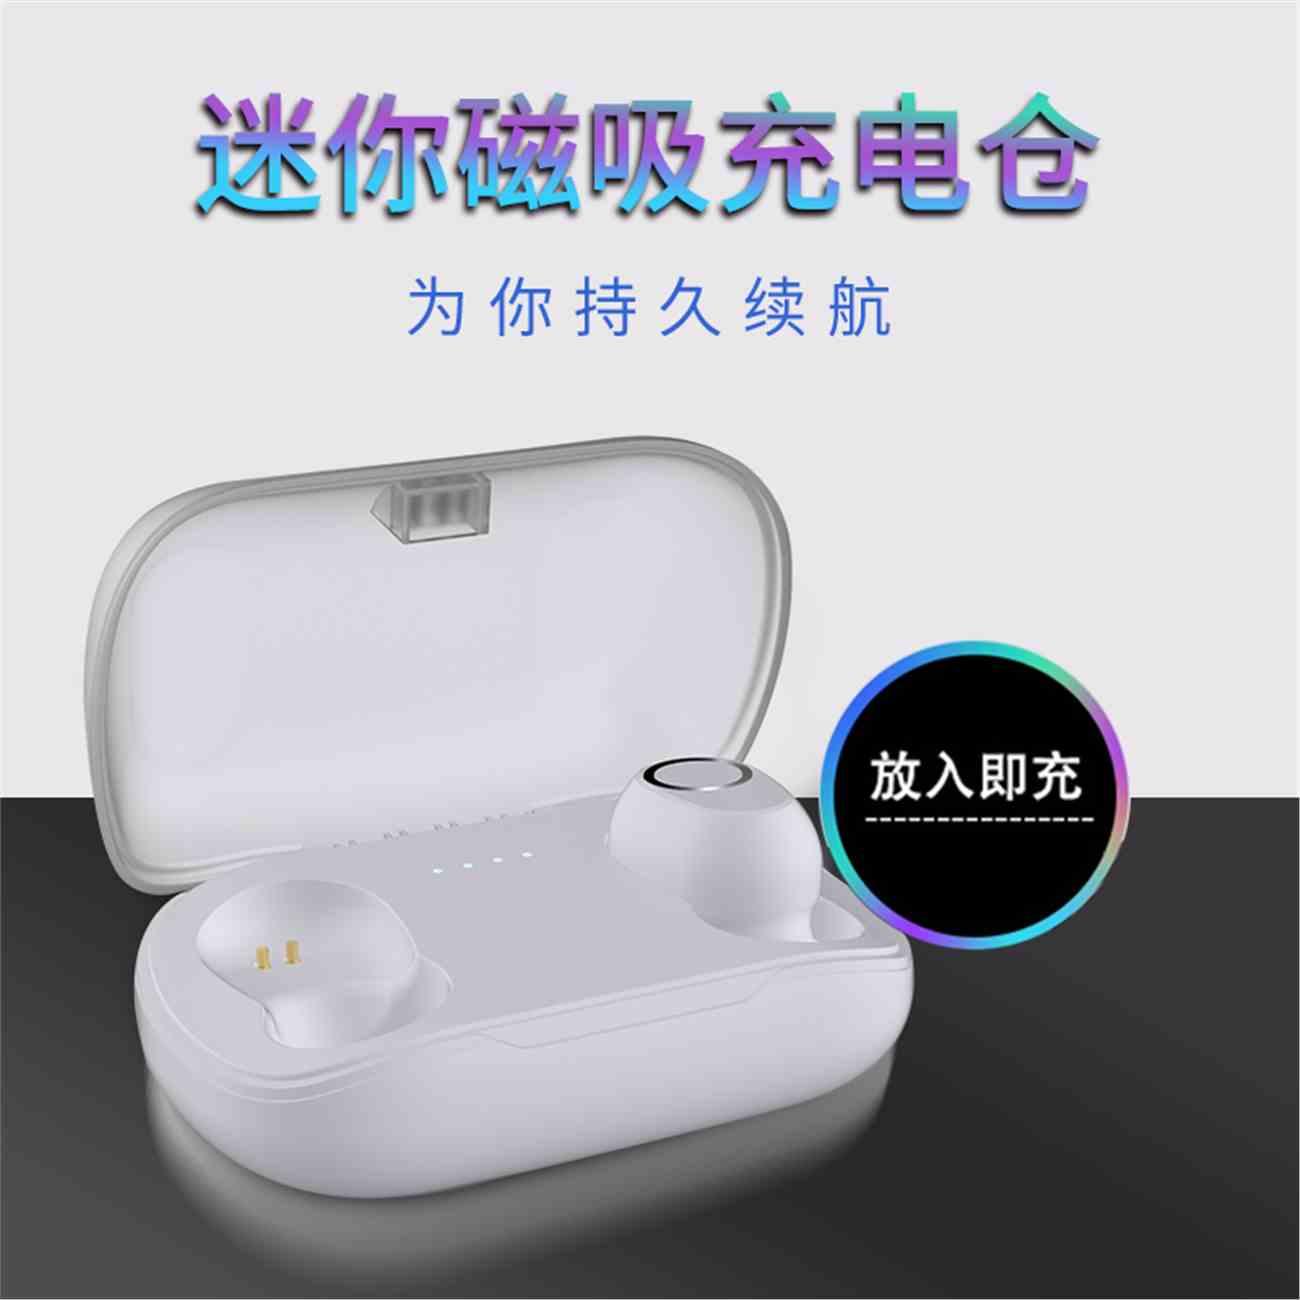 8bk-M789 TWS蓝牙耳机  力量威tws蓝牙耳机生产厂家/可贴牌可定做/厂家直销